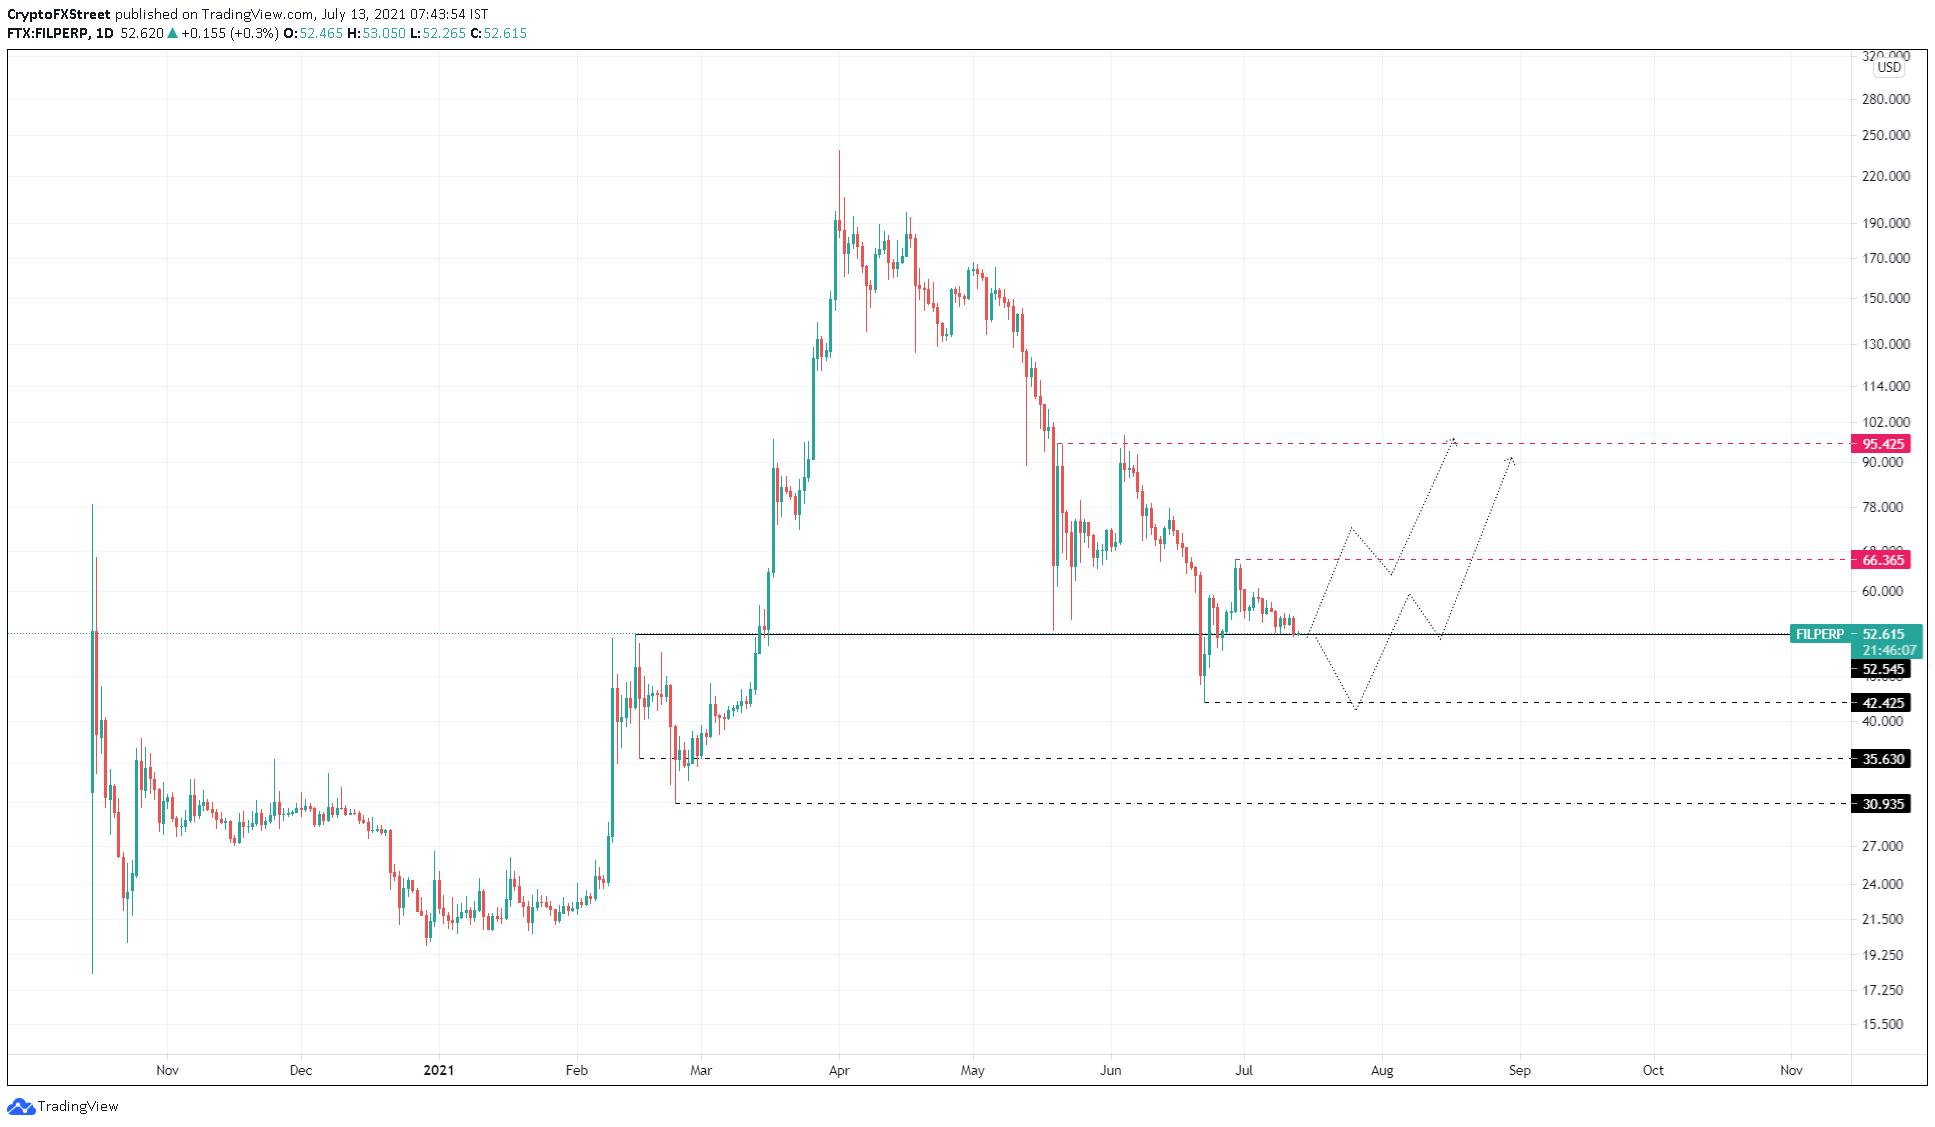 FIL/USDT 1-day chart